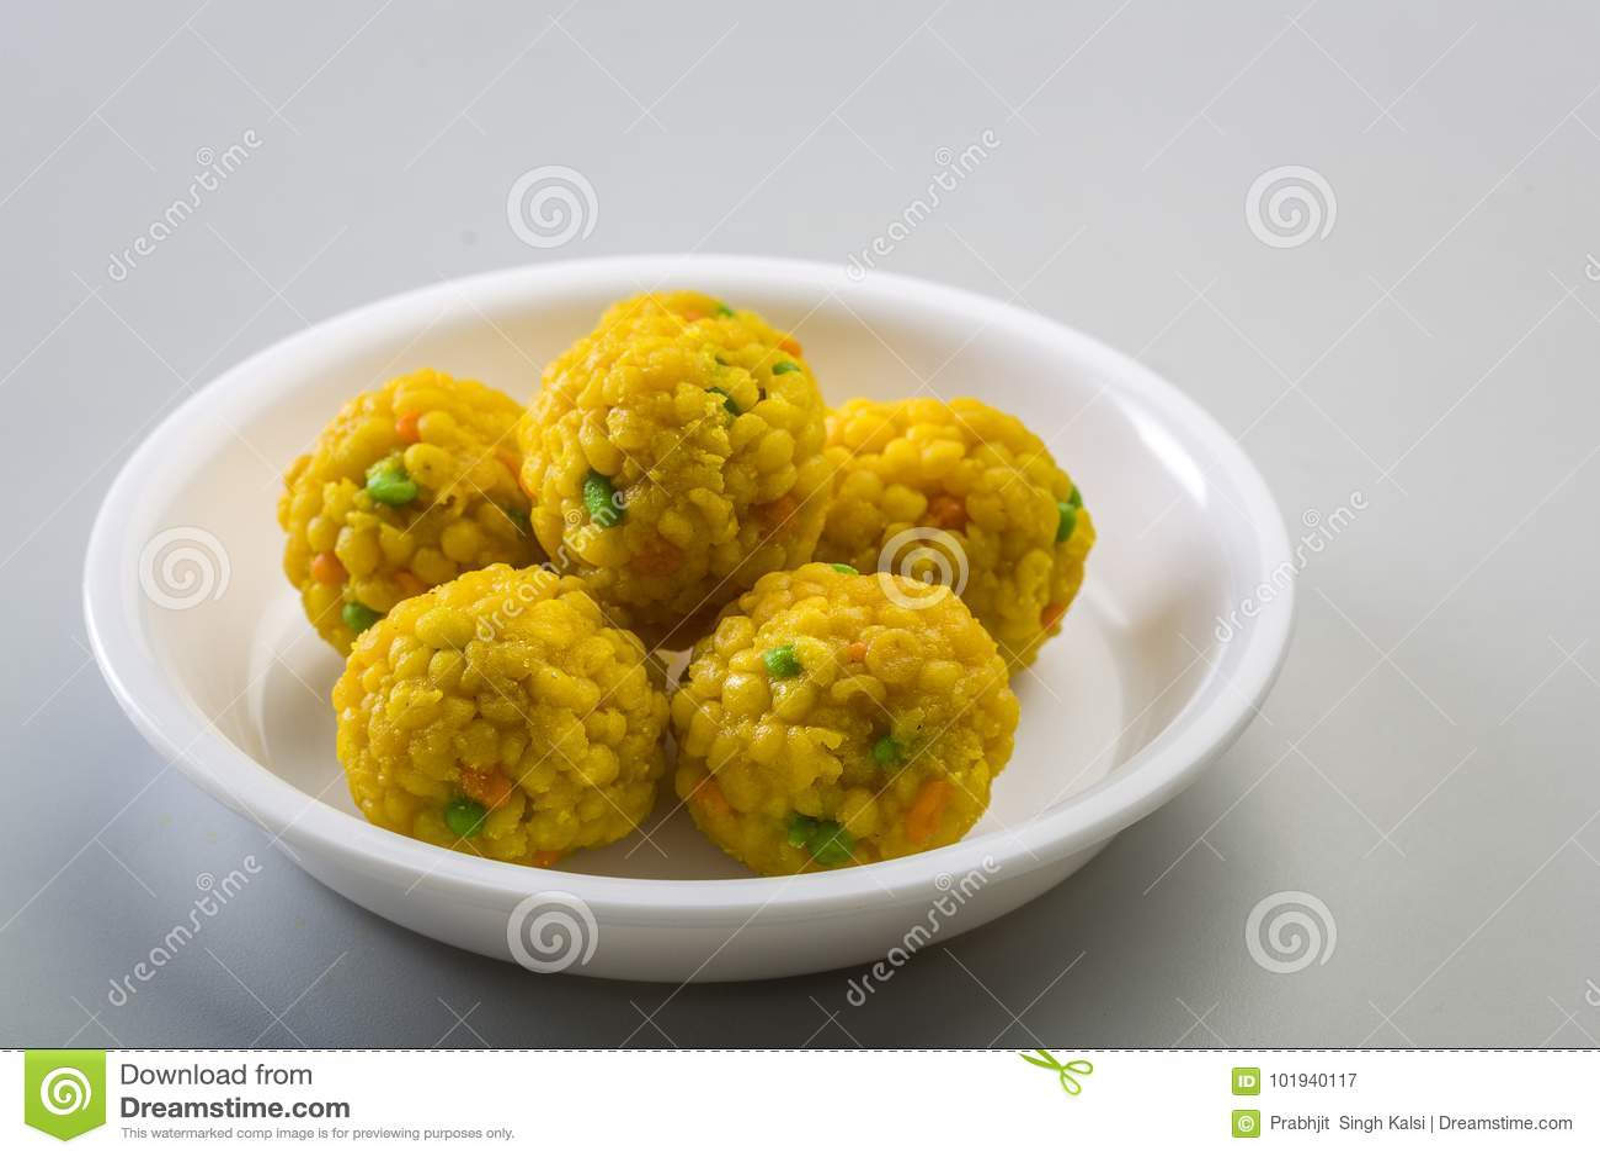 Laddu or laddoo or motichoor laddu